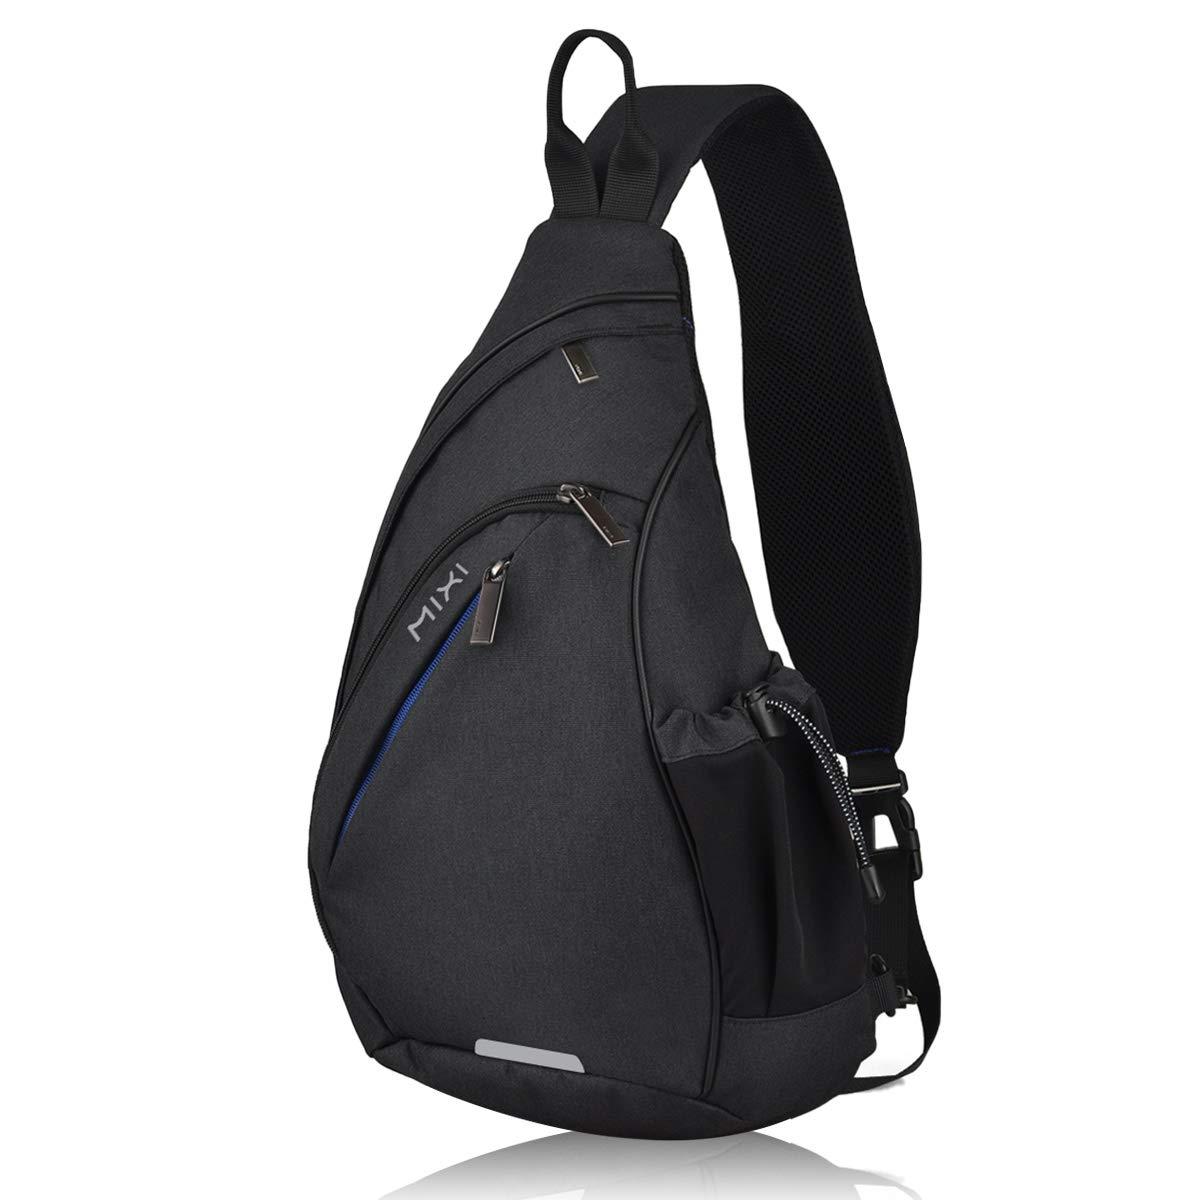 Hanke Sling Bag with USB Port Water Repellent Crossbody Personal Pocket Bag Lightweight Chest Bag for Cycling Walking Hiking Daypacks-19 inch,Black